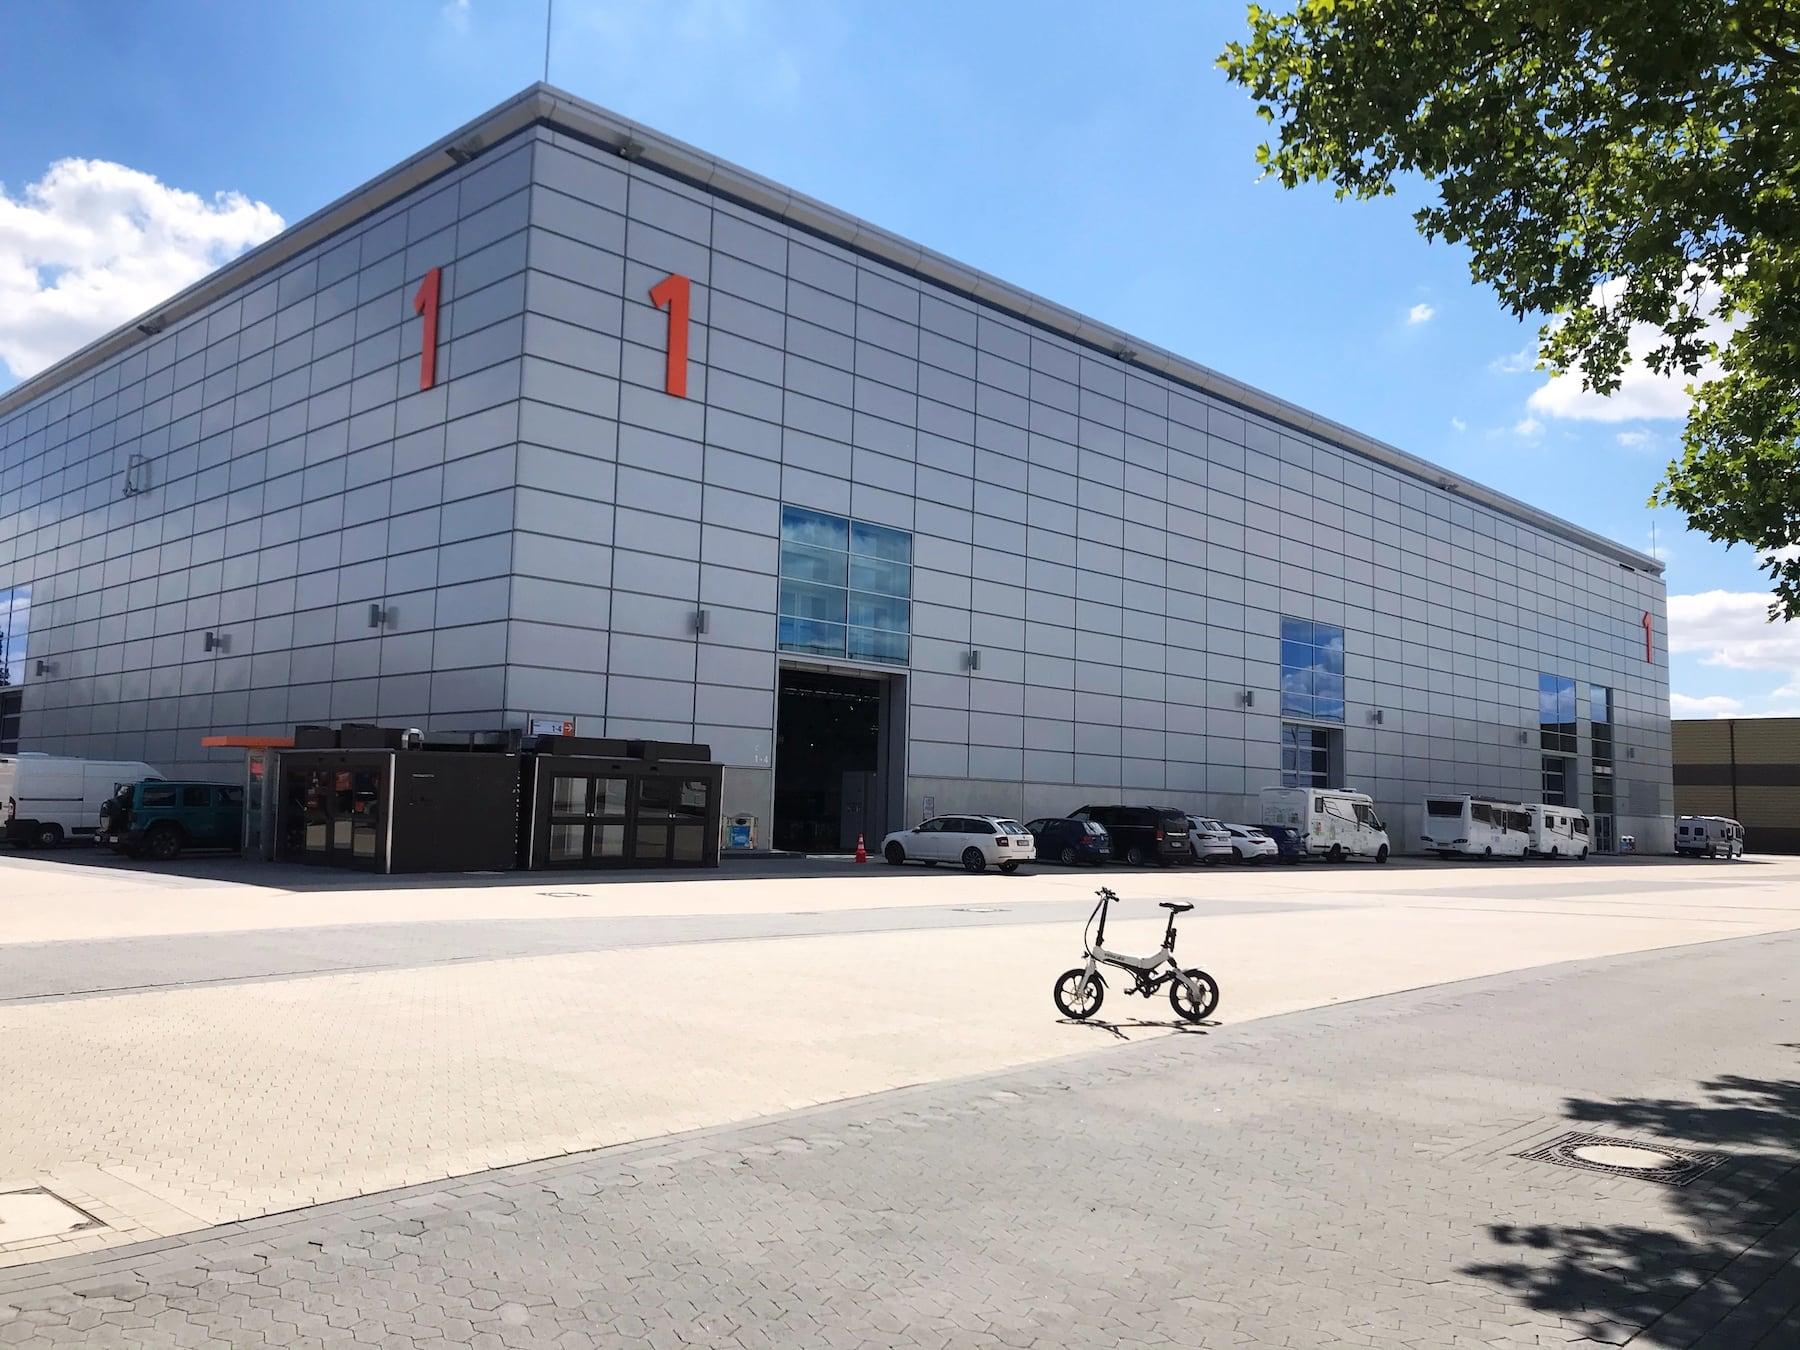 Jaaaaa, mir san mit'm Radel da... Neue Halle 1 Messe Düsseldorf